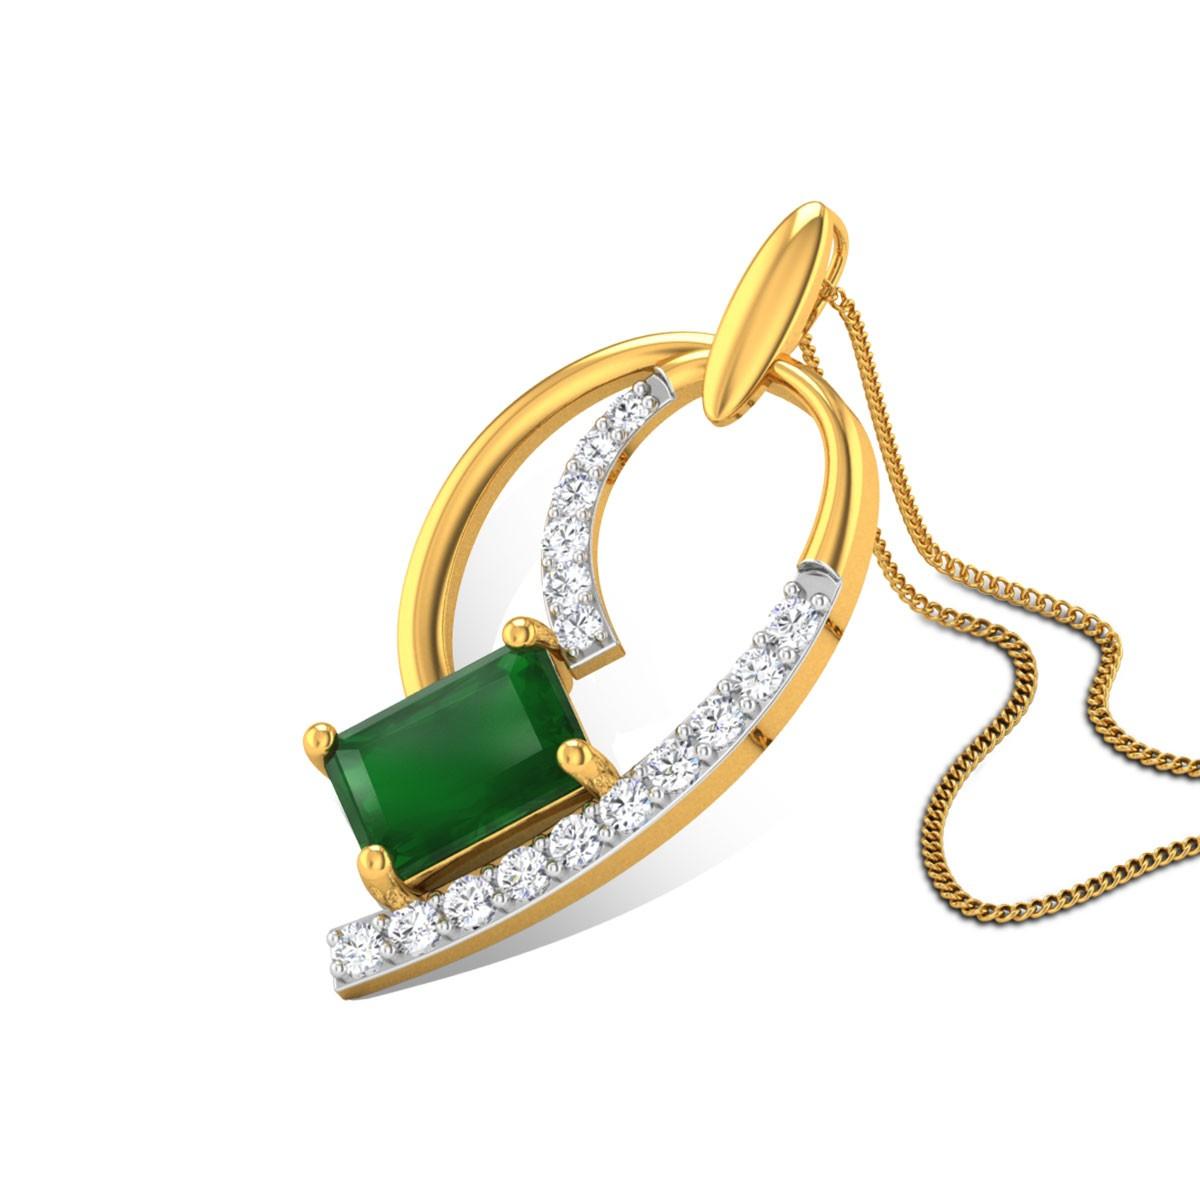 Delilah Diamond Pendant